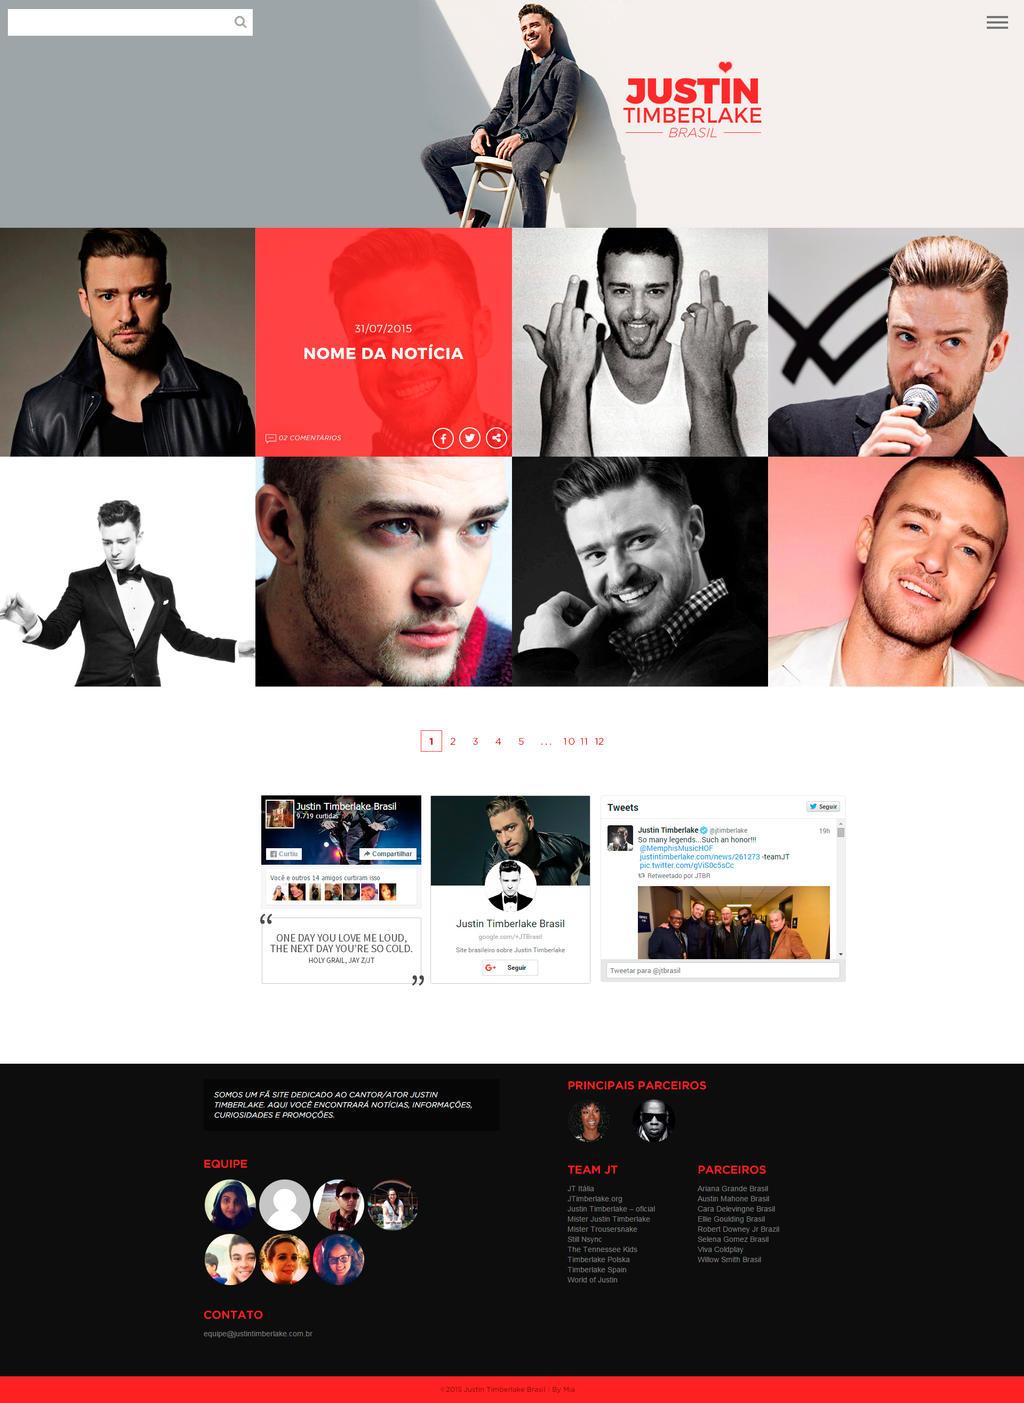 Justin Timberlake Brasil 2016 by helenamilena